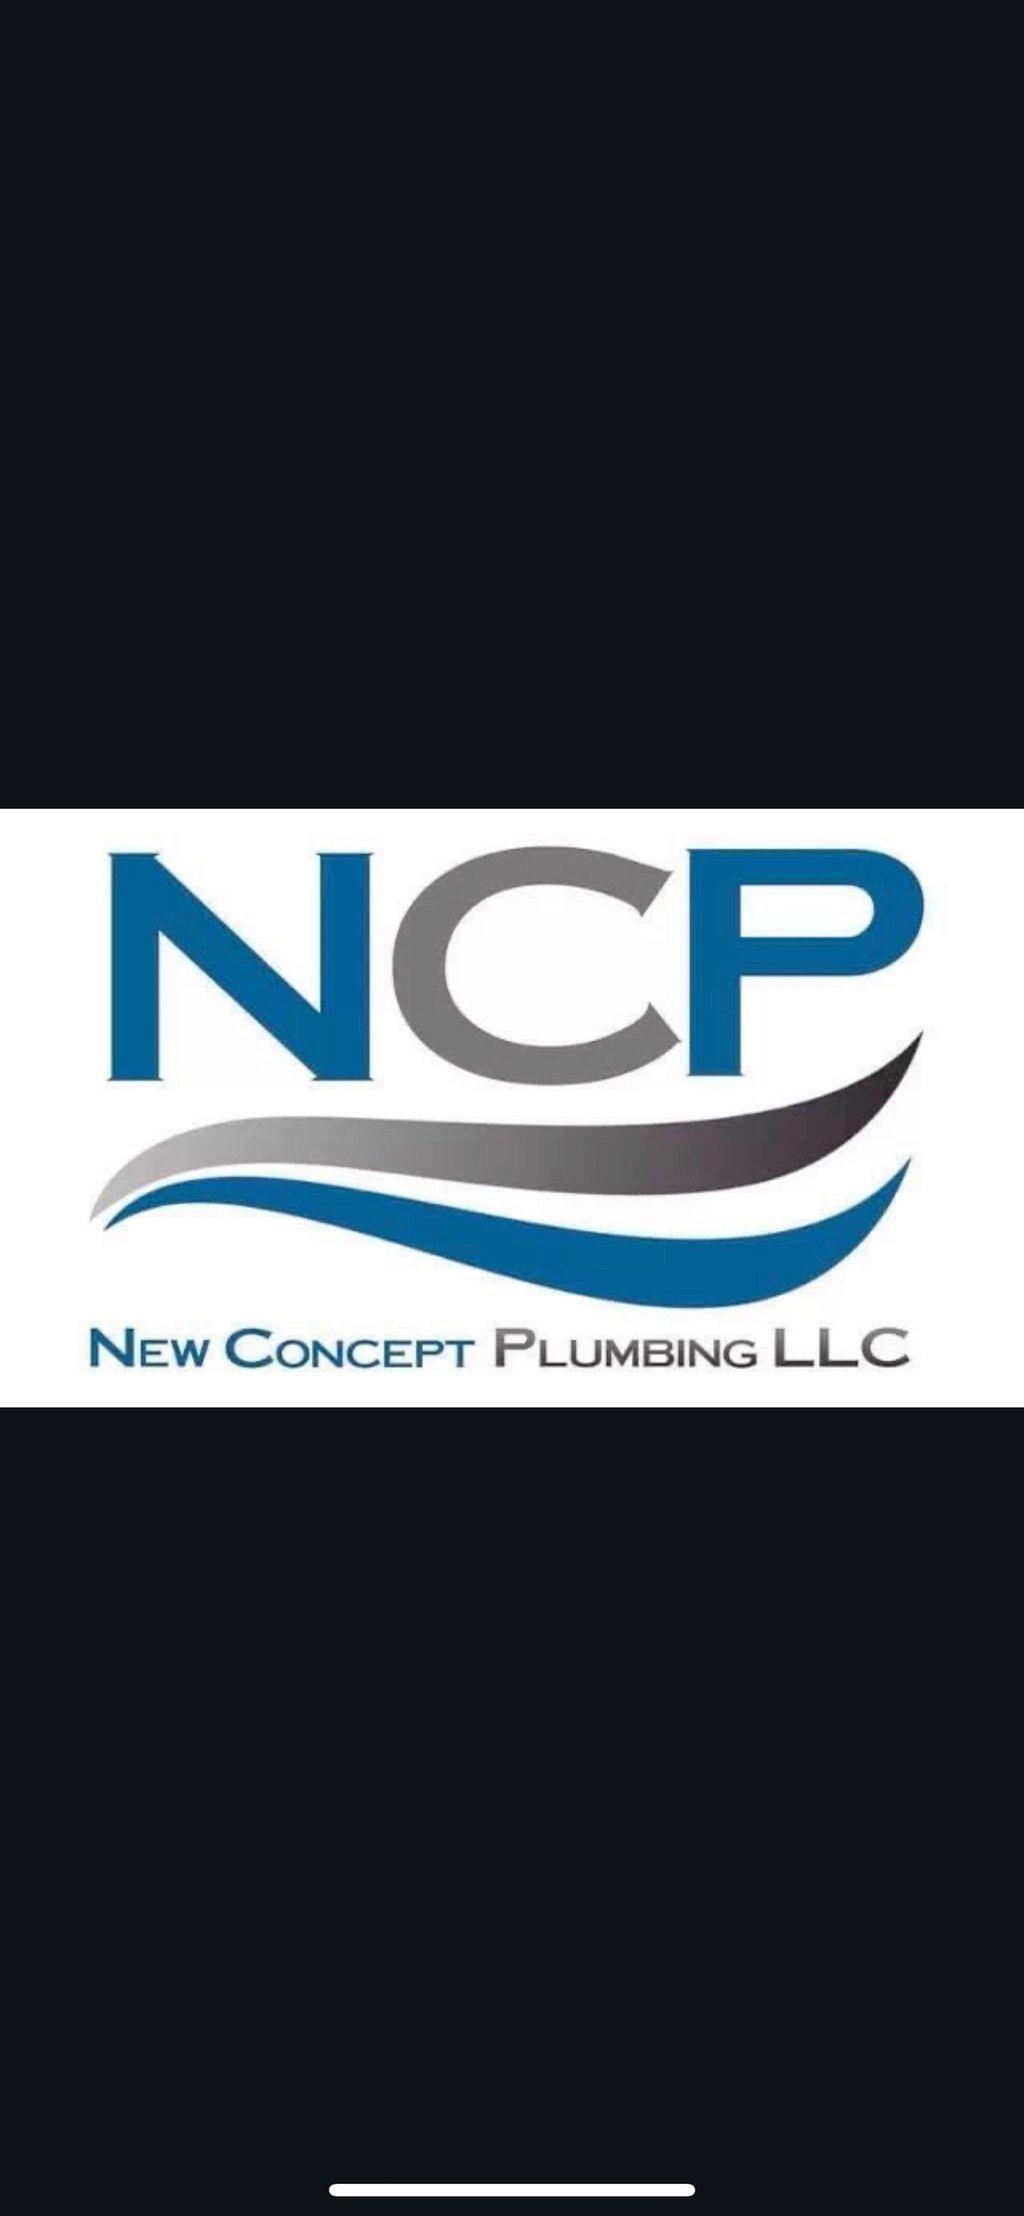 New Concept Plumbing, LLC